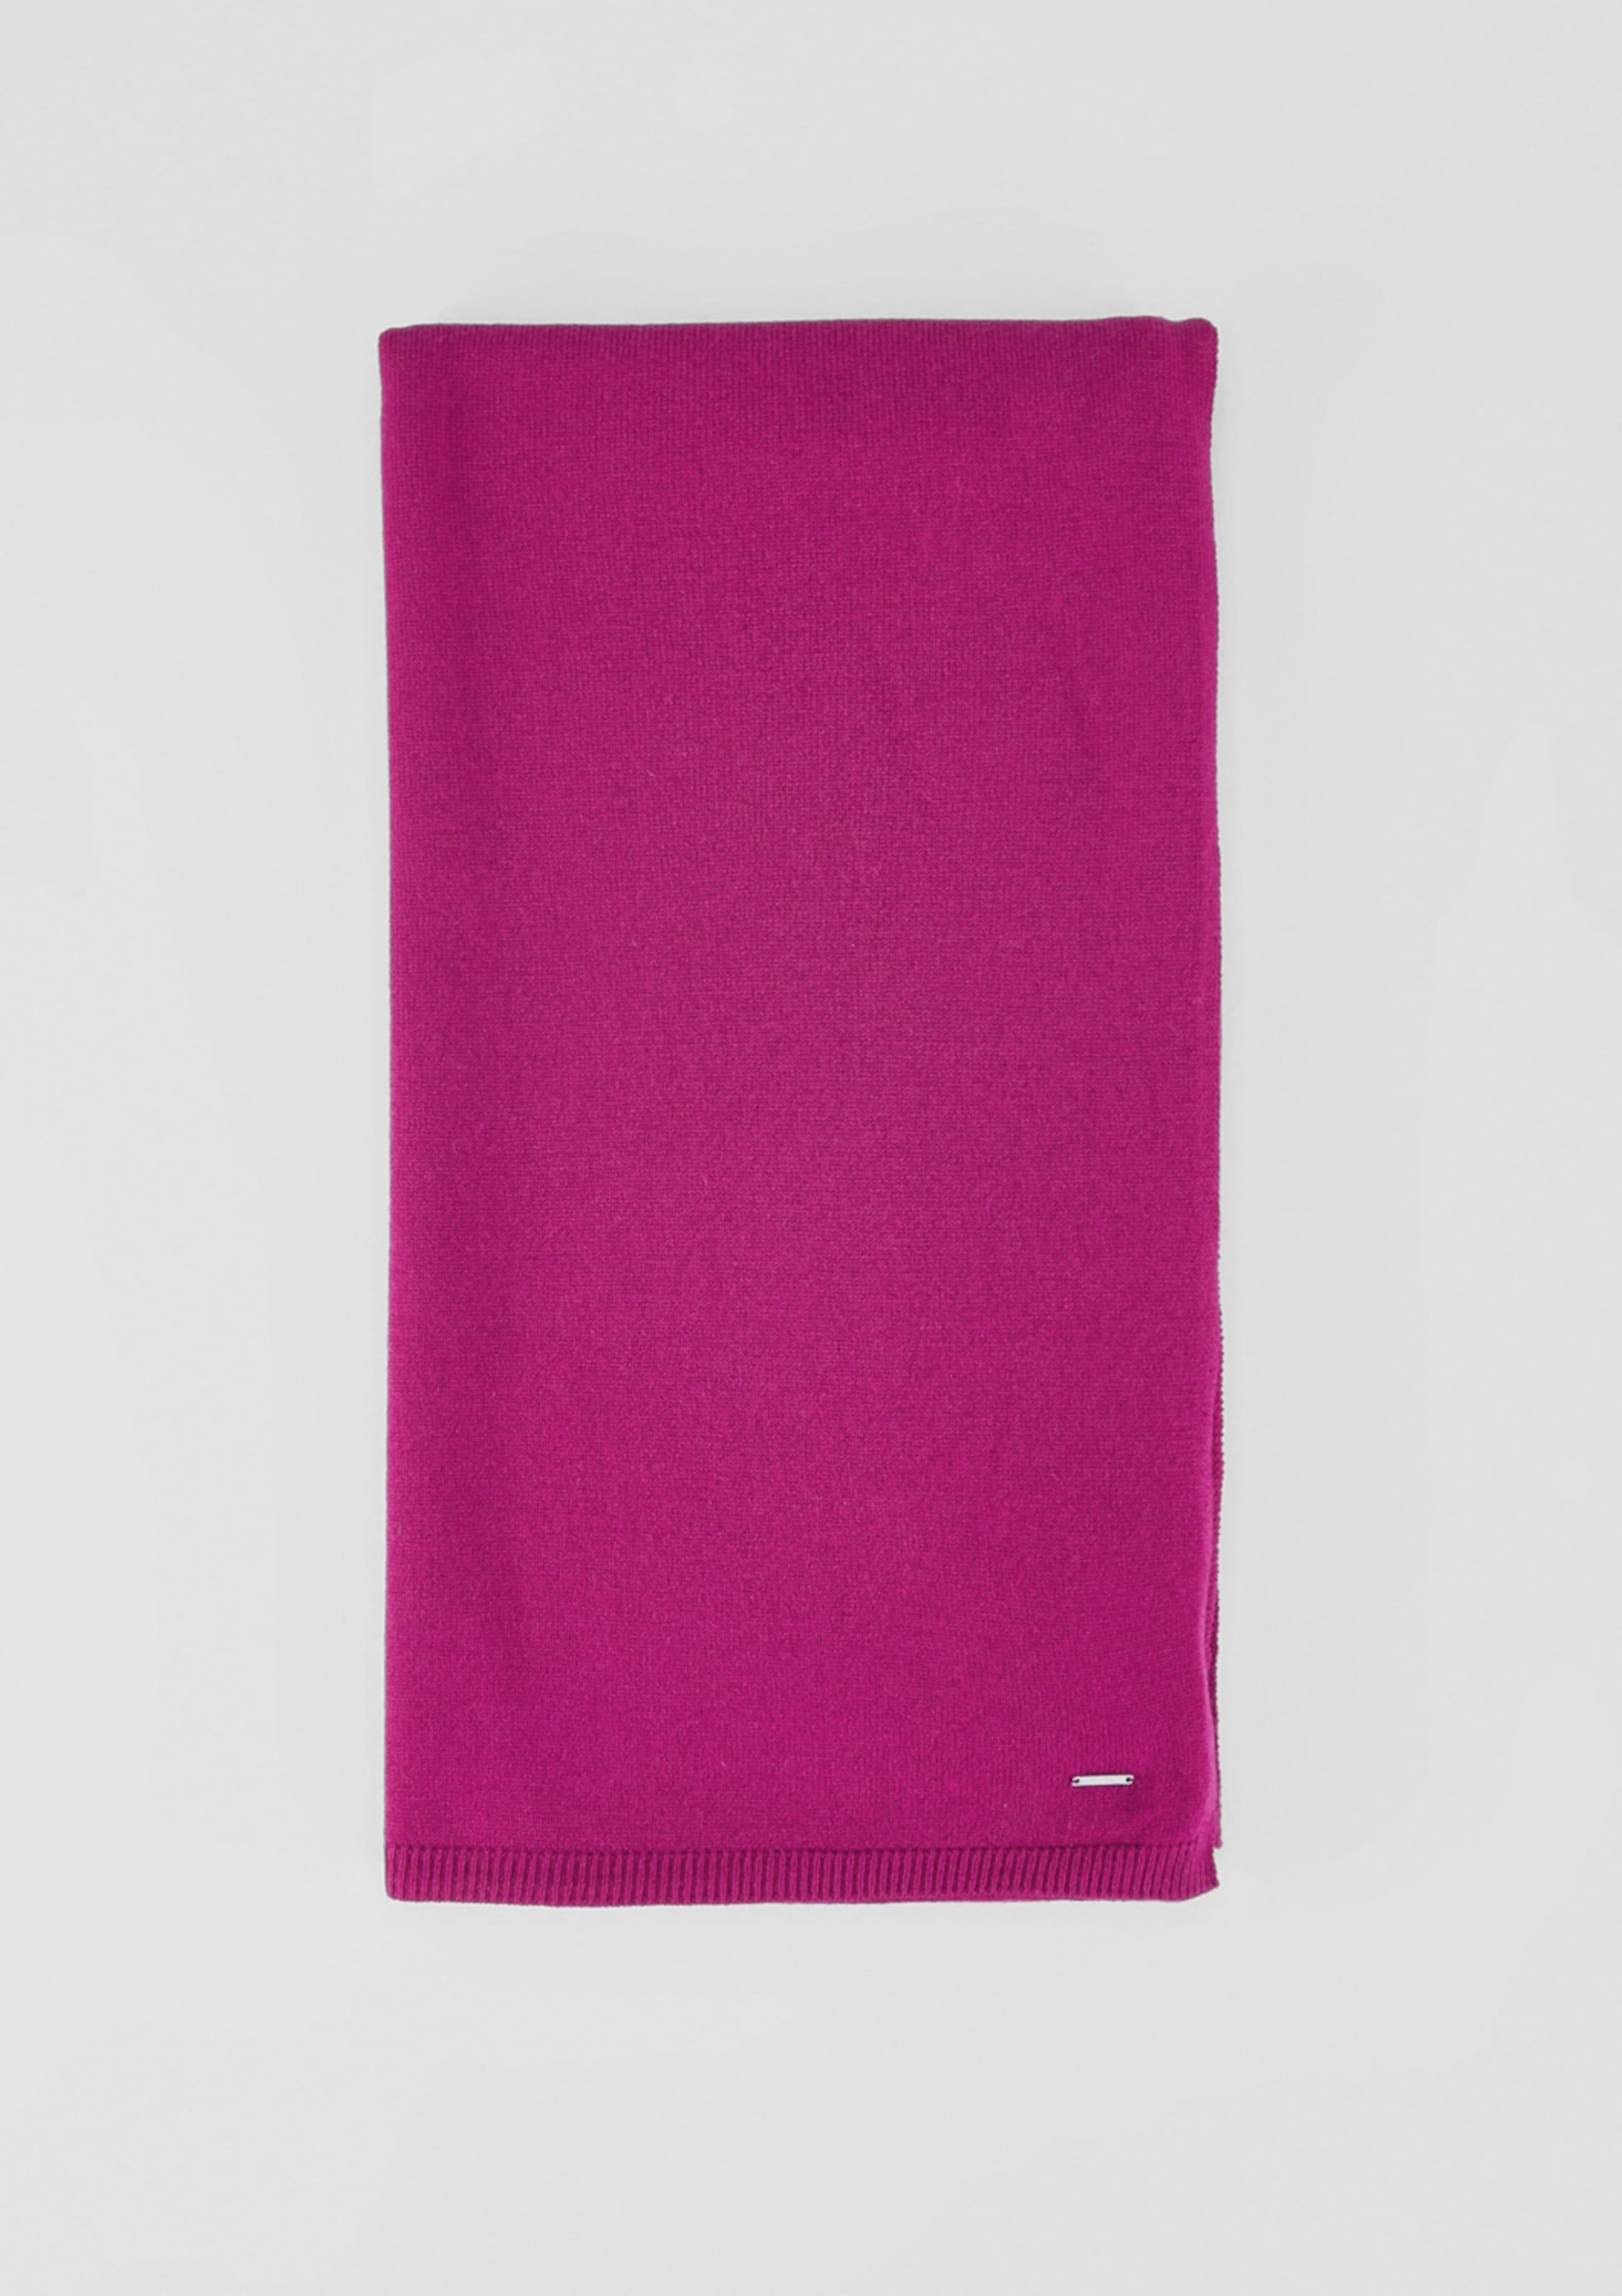 In S oliver Pink Schal WIEDY2H9